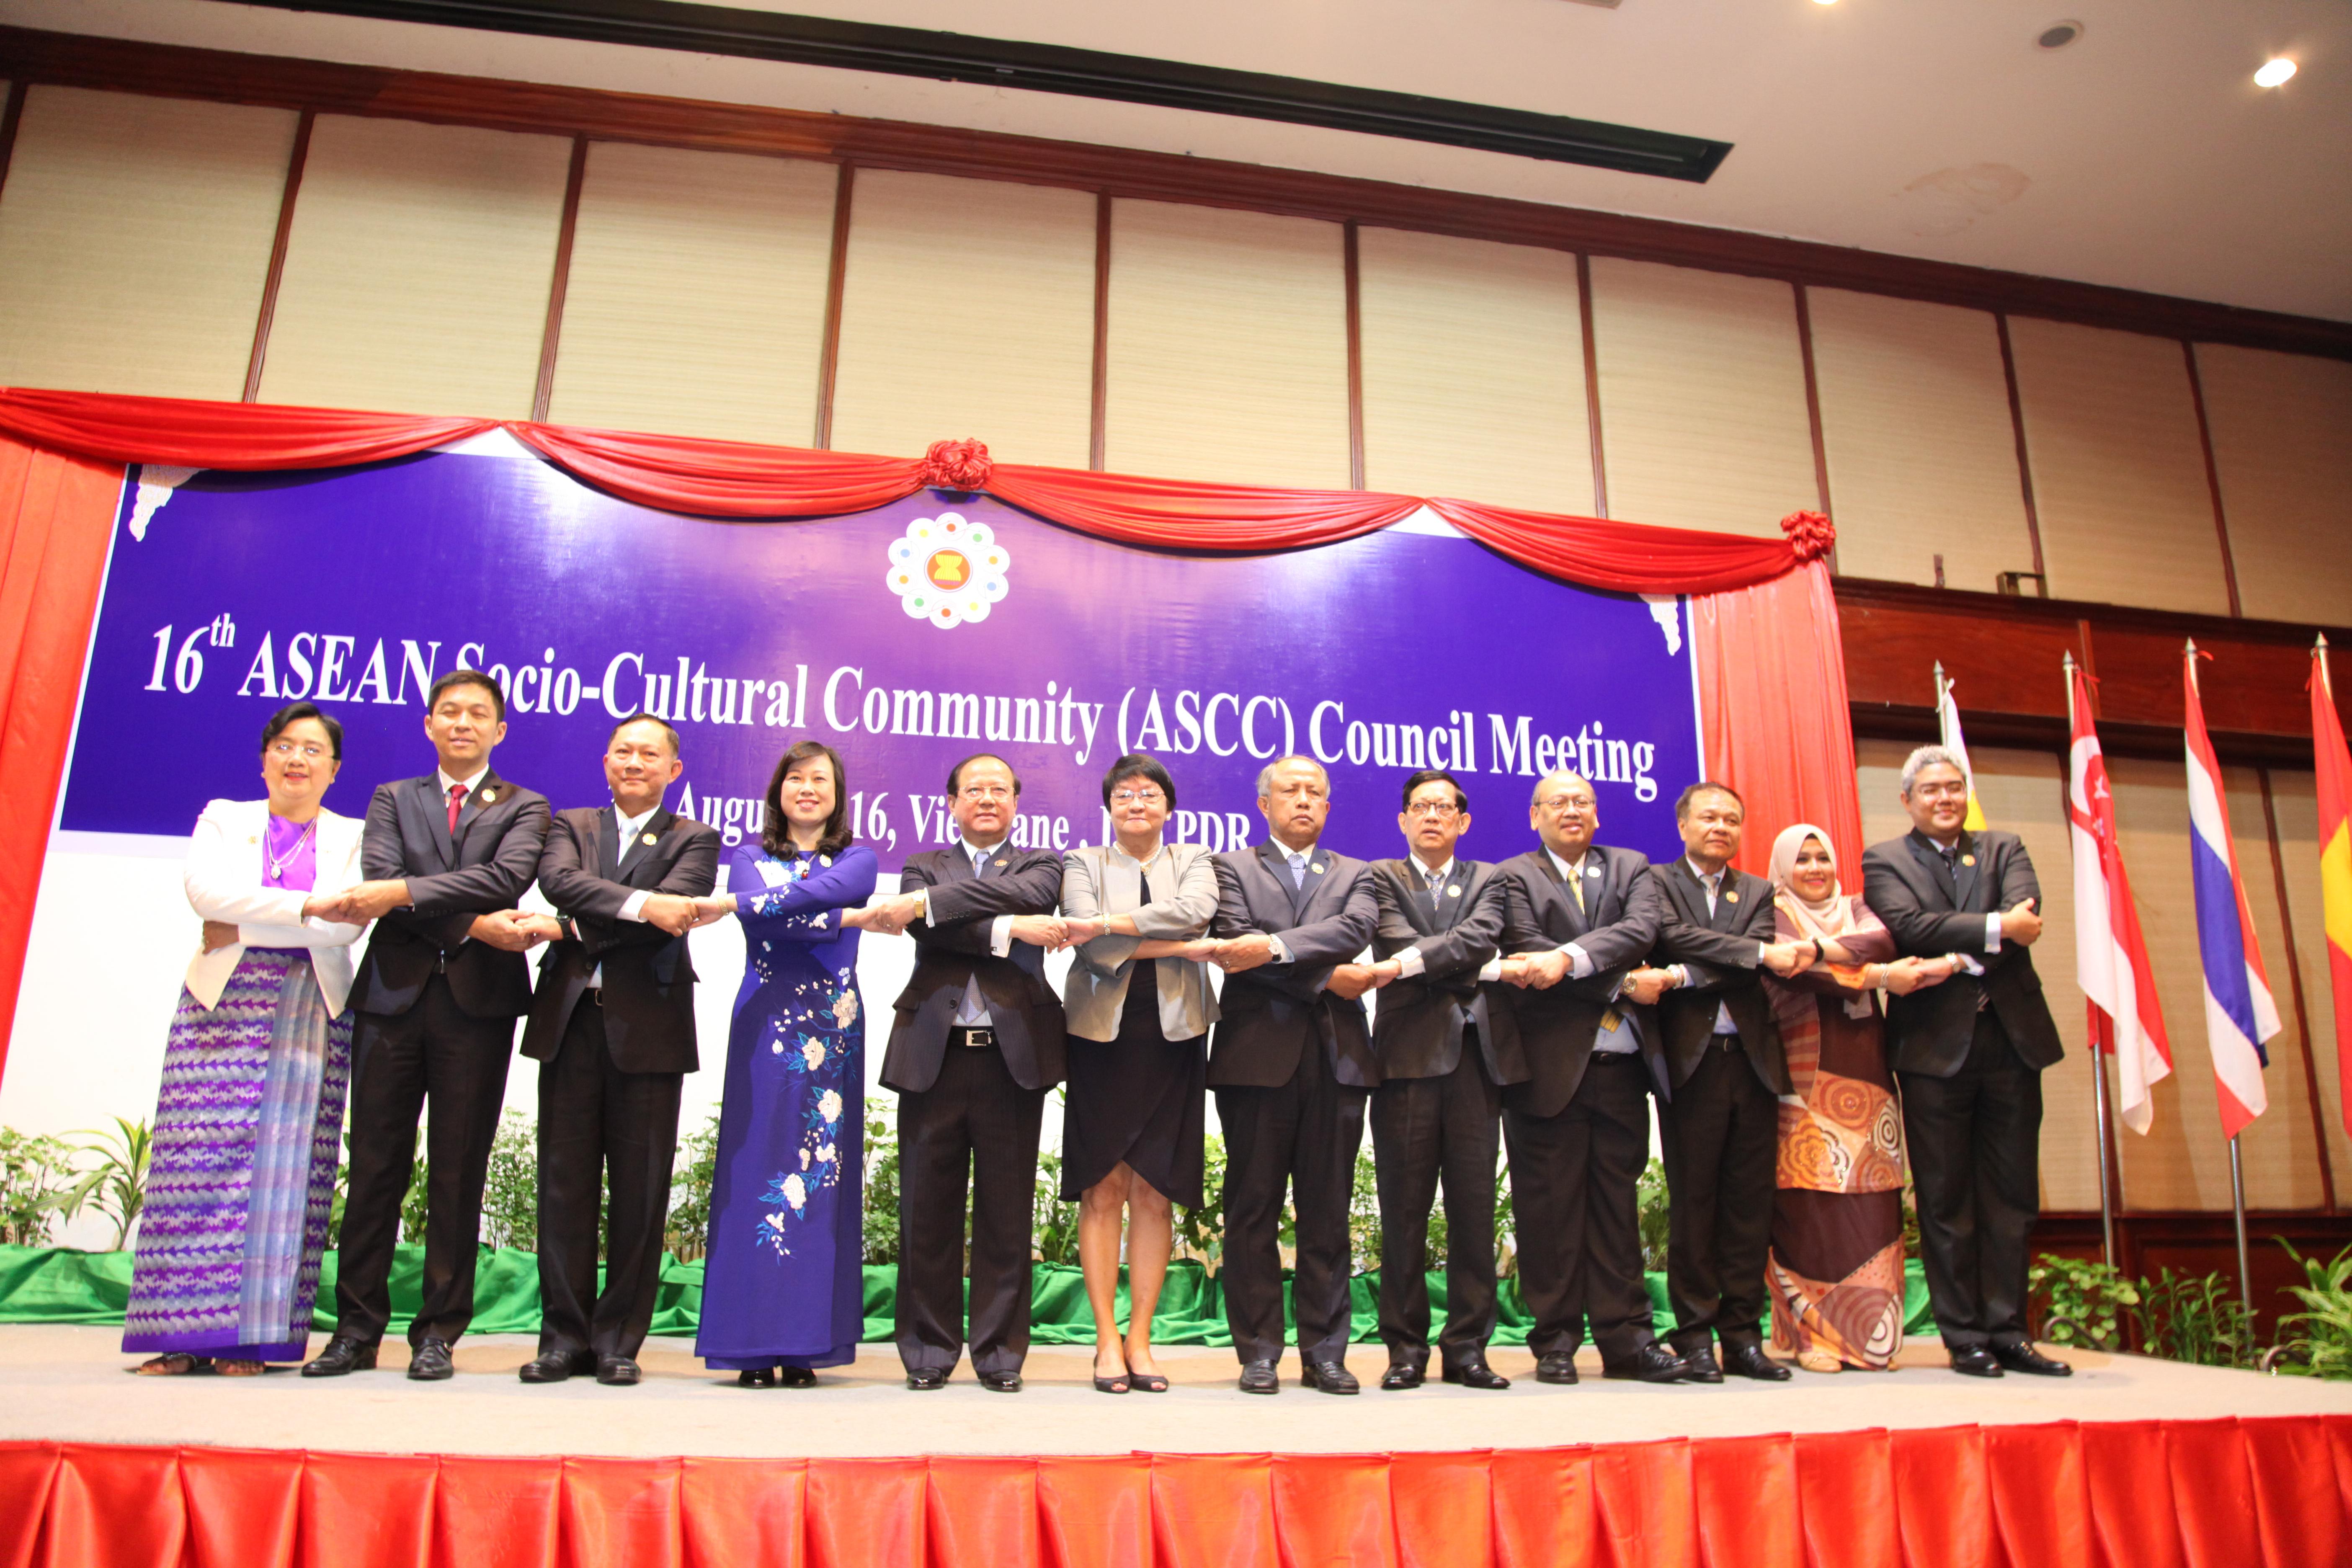 16th ASEAN Socio-Cultural Community Council Meeting opens